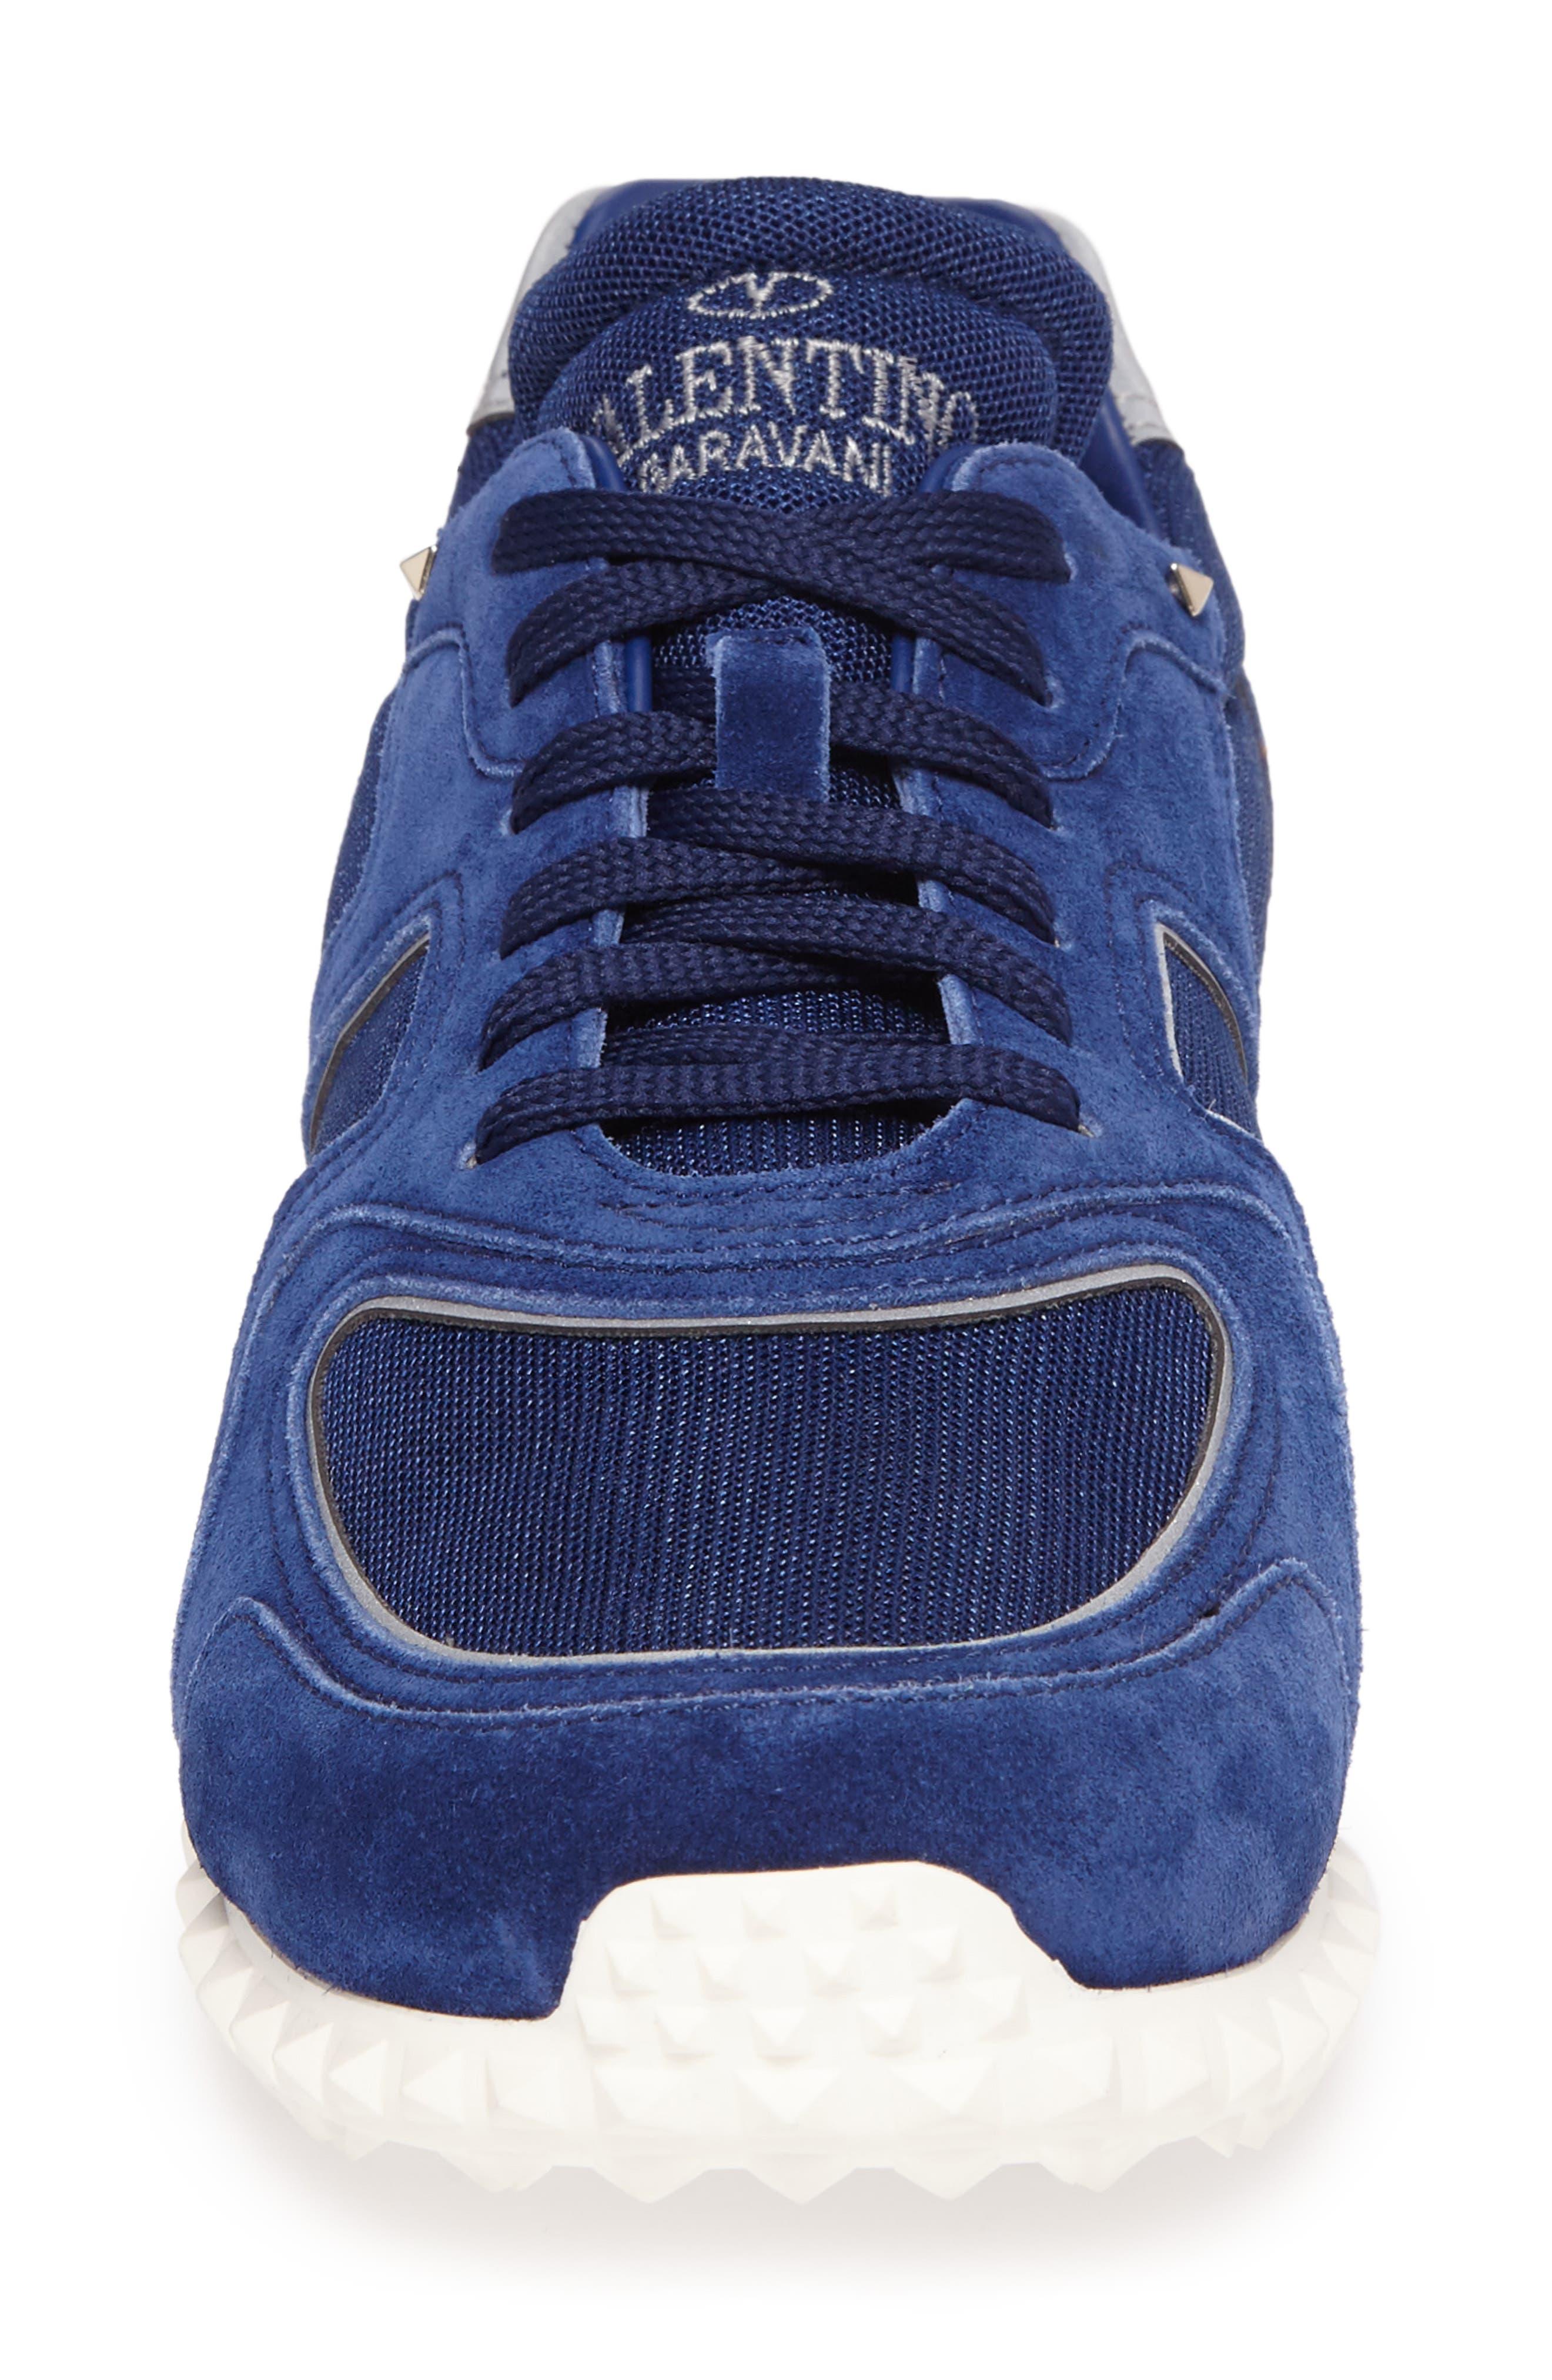 Soul AM Sneaker,                             Alternate thumbnail 4, color,                             Blue Royal/ Blue Royal